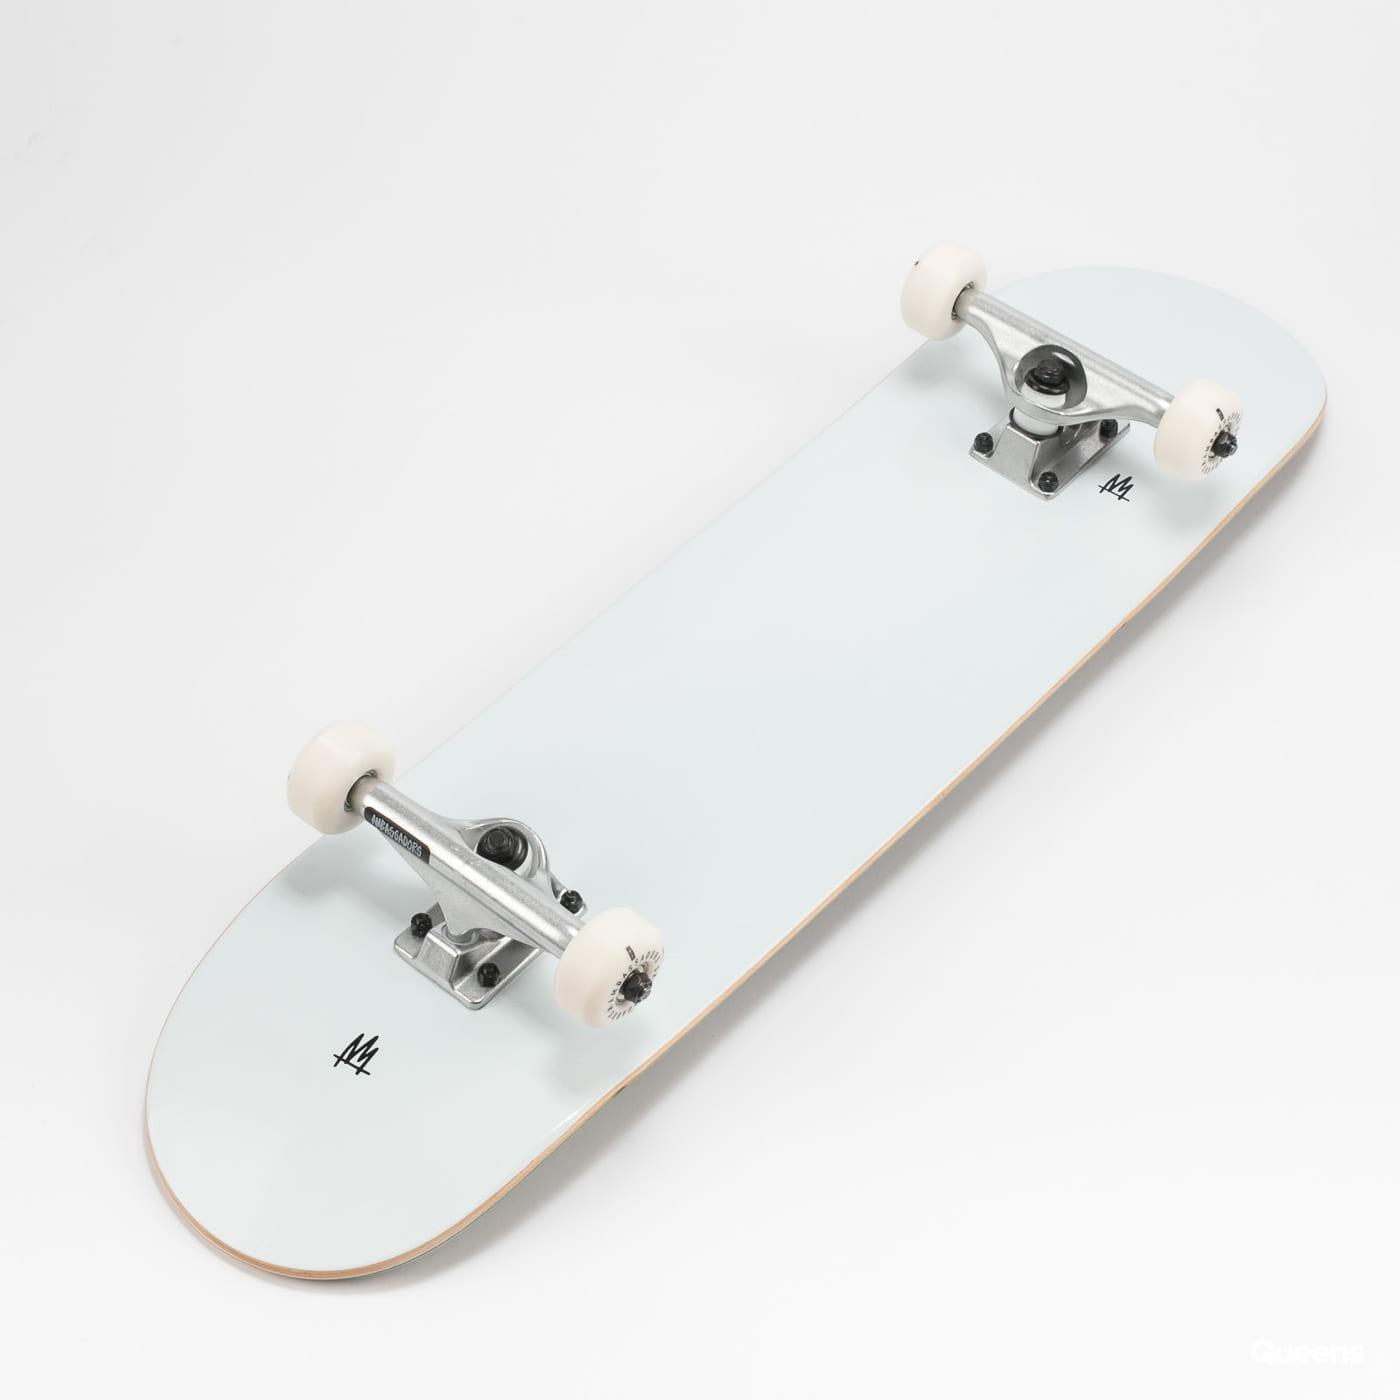 Ambassadors Komplet Skateboard Basic White bílý